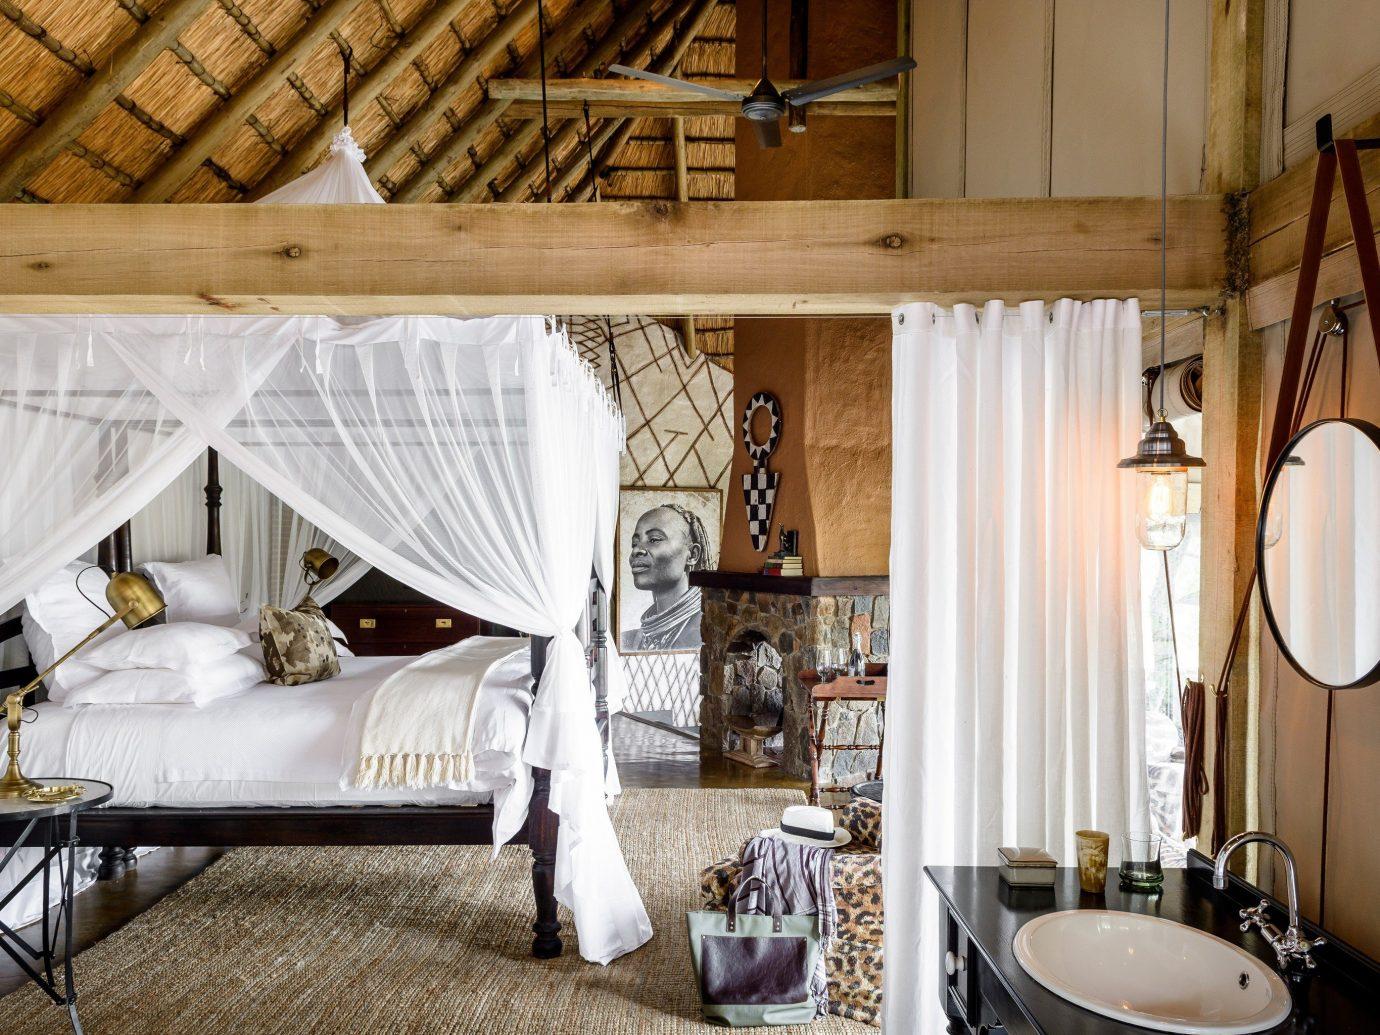 Hotels Trip Ideas indoor room property home cottage interior design estate farmhouse living room